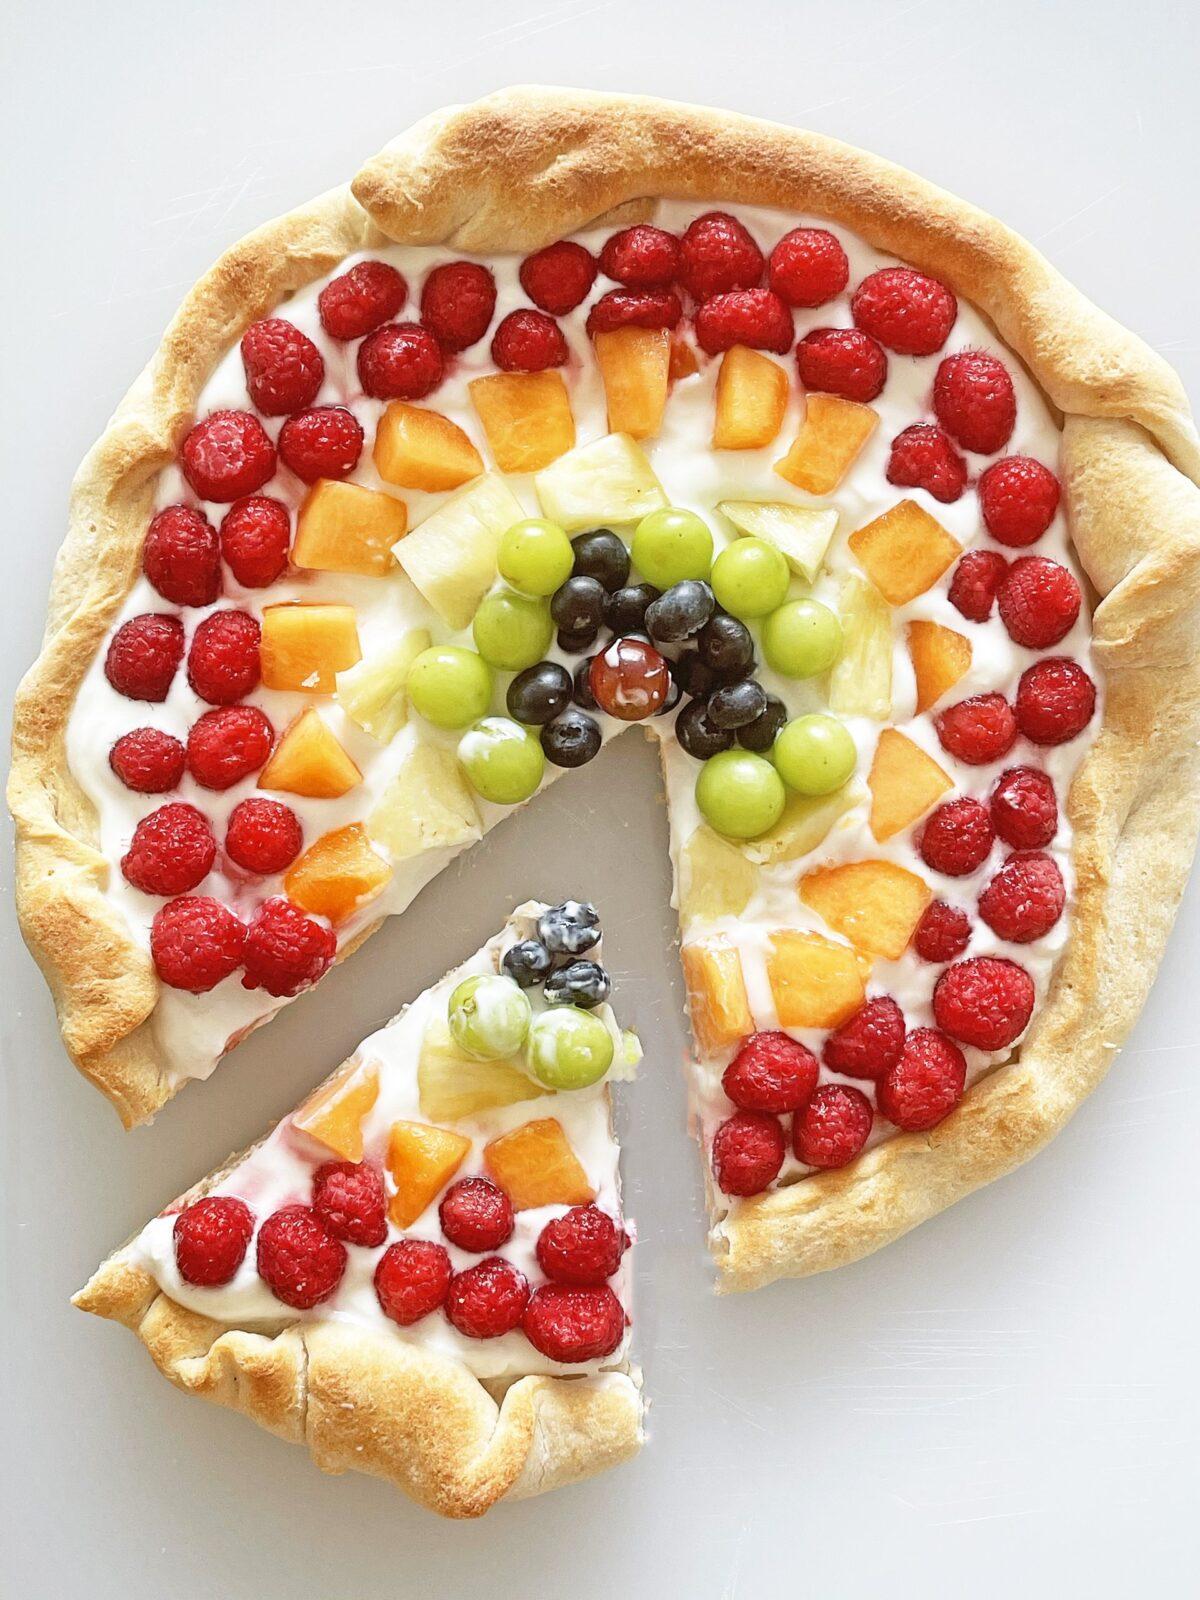 Rainbow Dessert Pizza Recipe. Super easy dessert pizza with just pizza dough, yogurt, and fruit. This is a fun dessert for everyone to make together. Happy Rainbow Pizza and Unicorn dessert dreams! #priderecipes #rainbowdessert